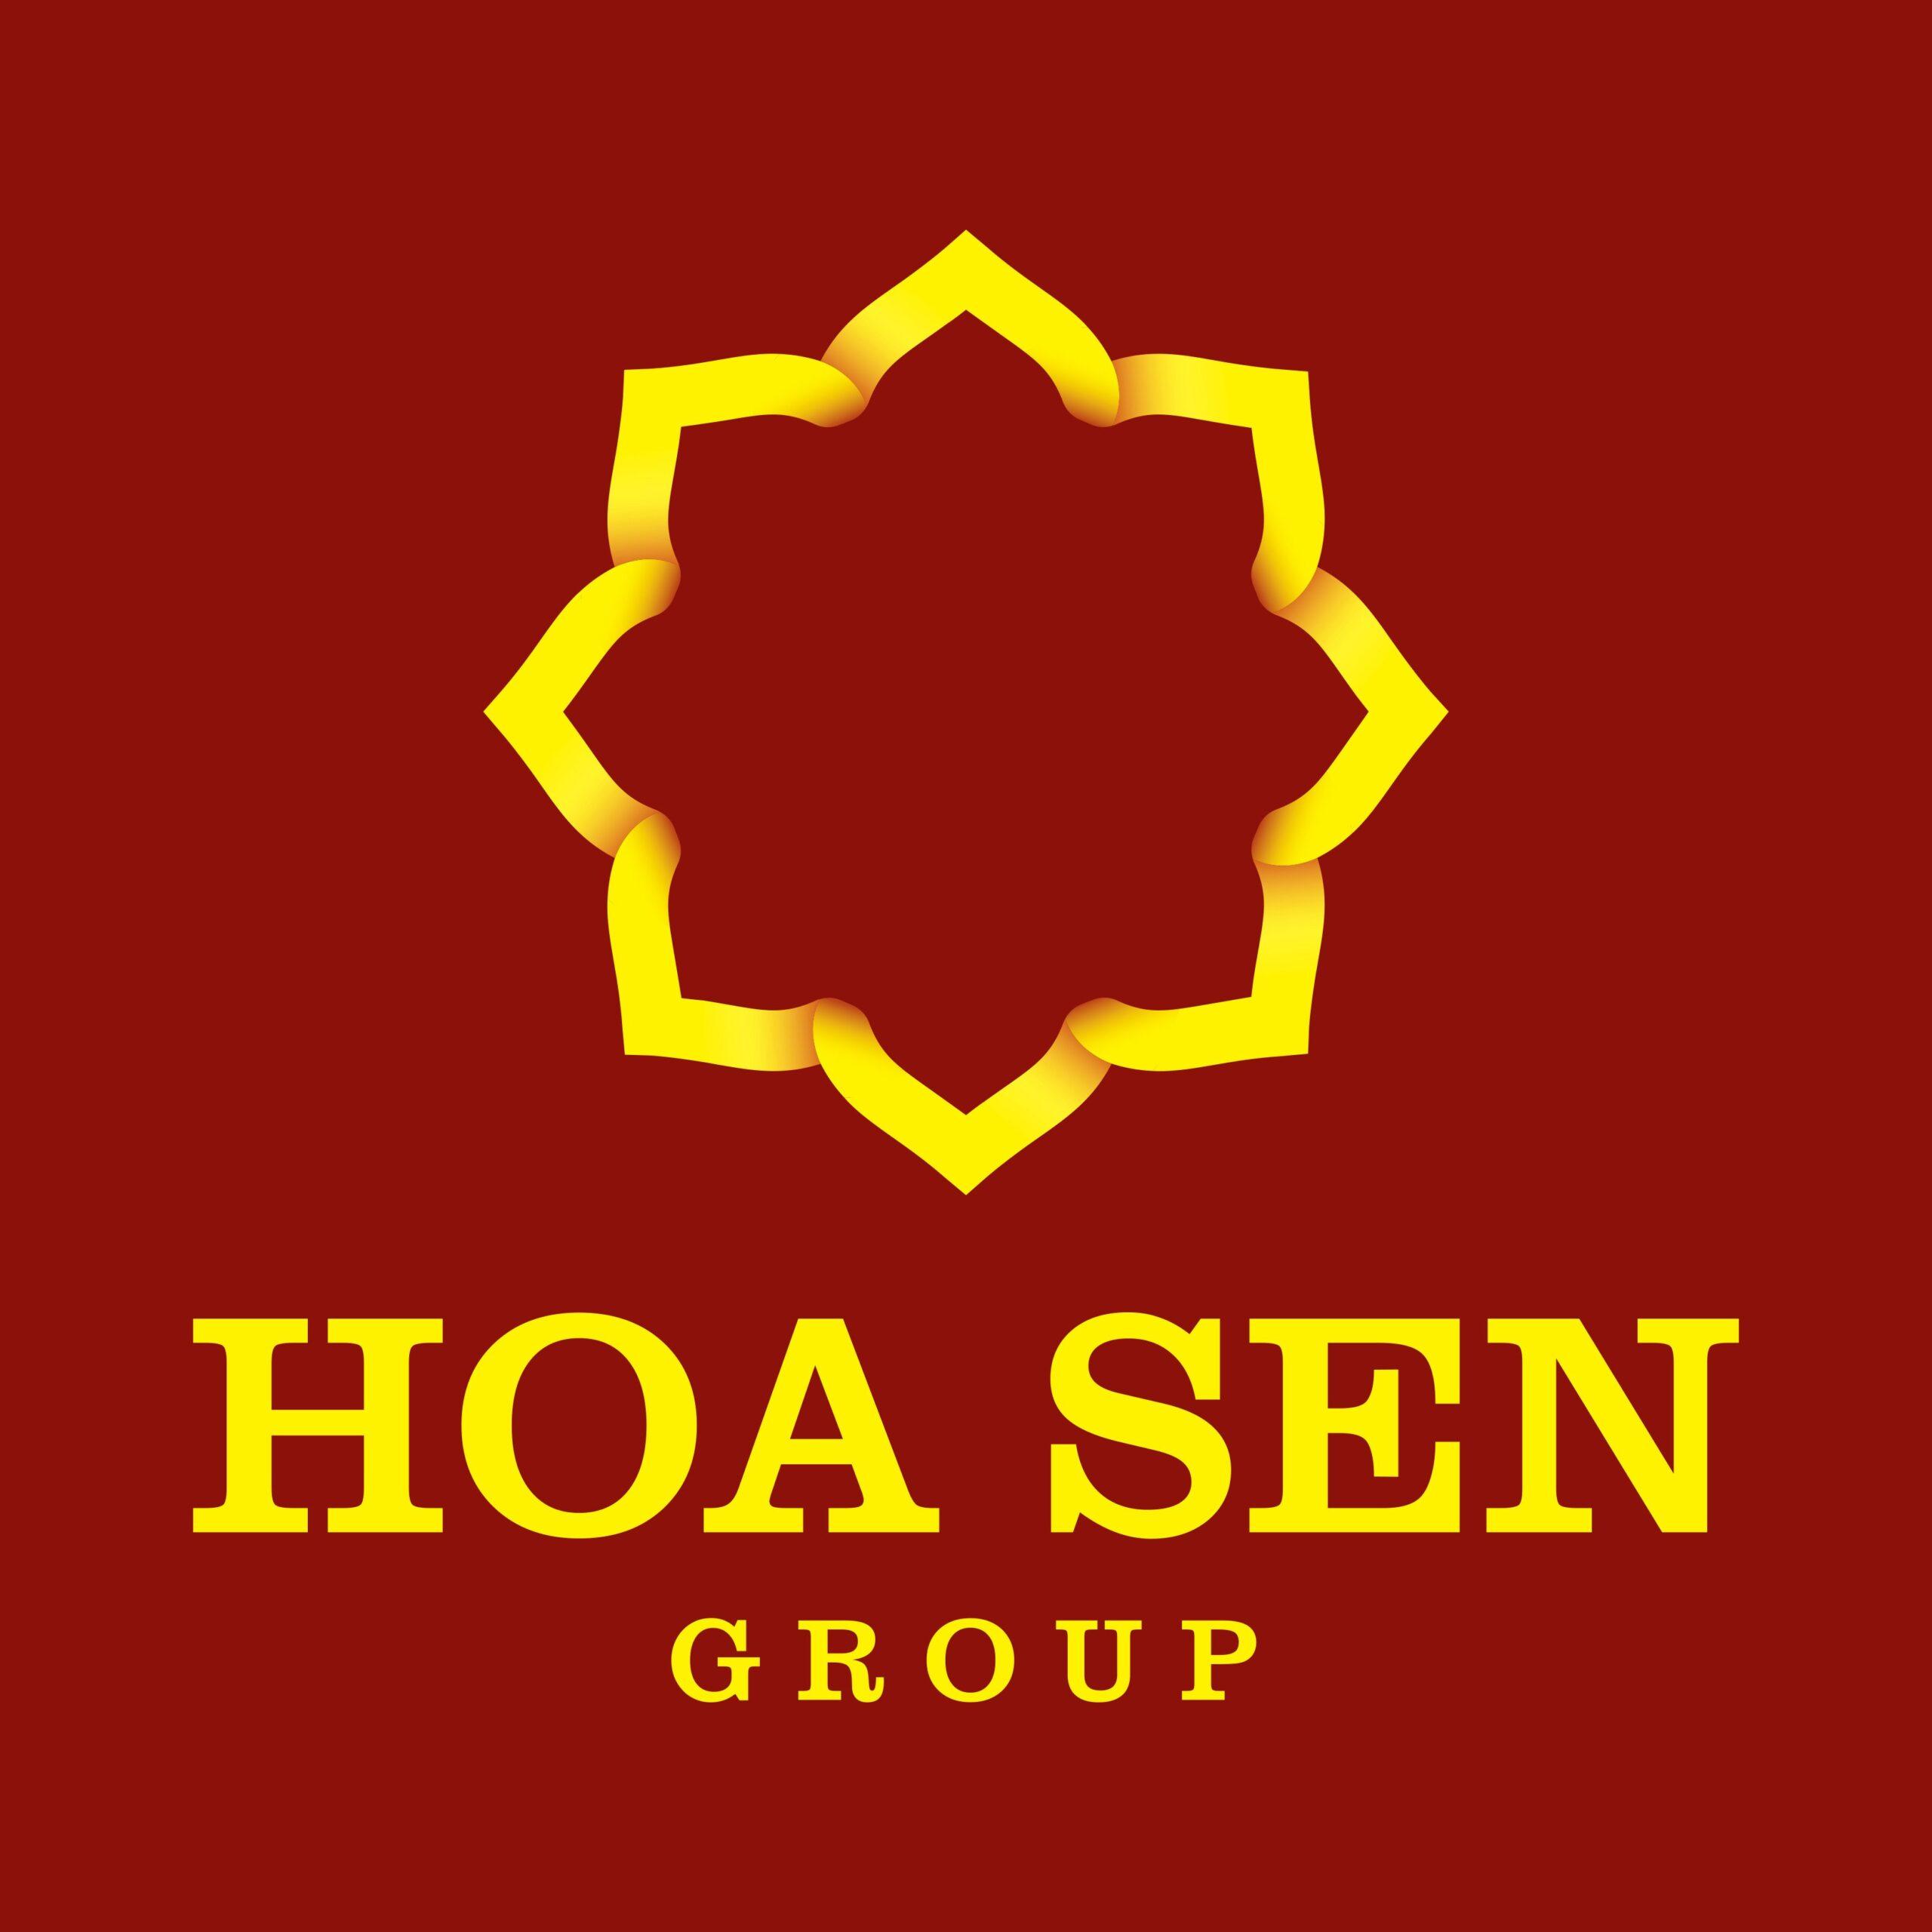 Logo chủ đầu tư Hoa Sen Group